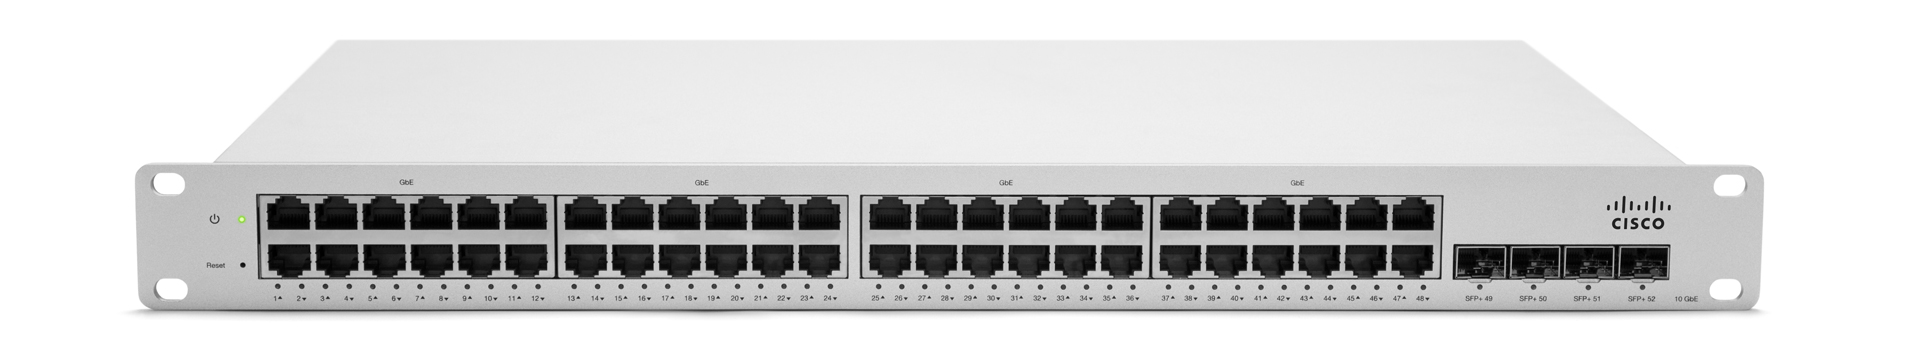 cisco-meraki-switch-ports